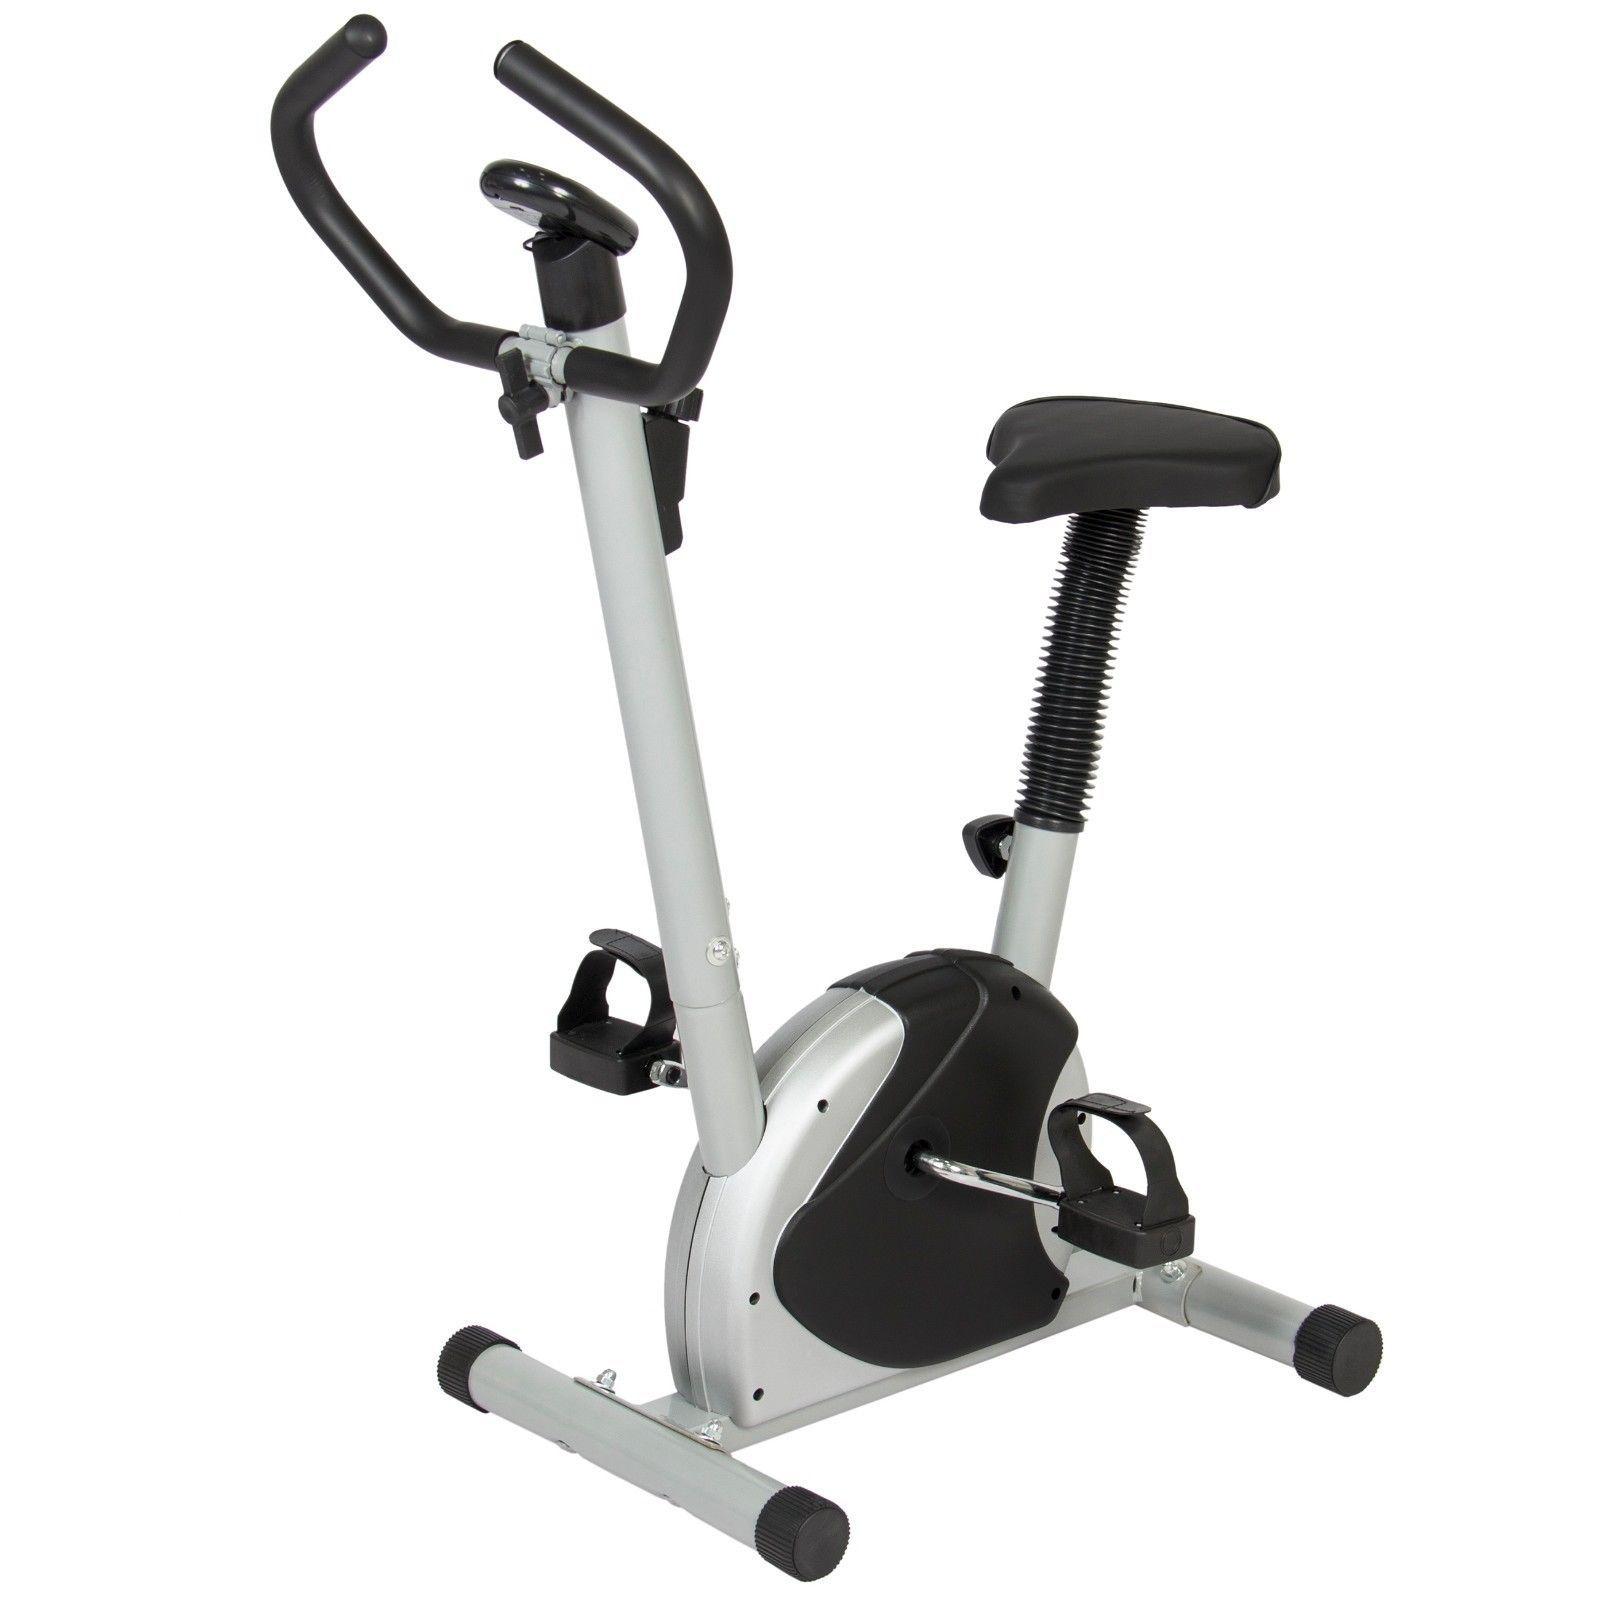 Exercise bike fitness cycling machine cardio aerobic